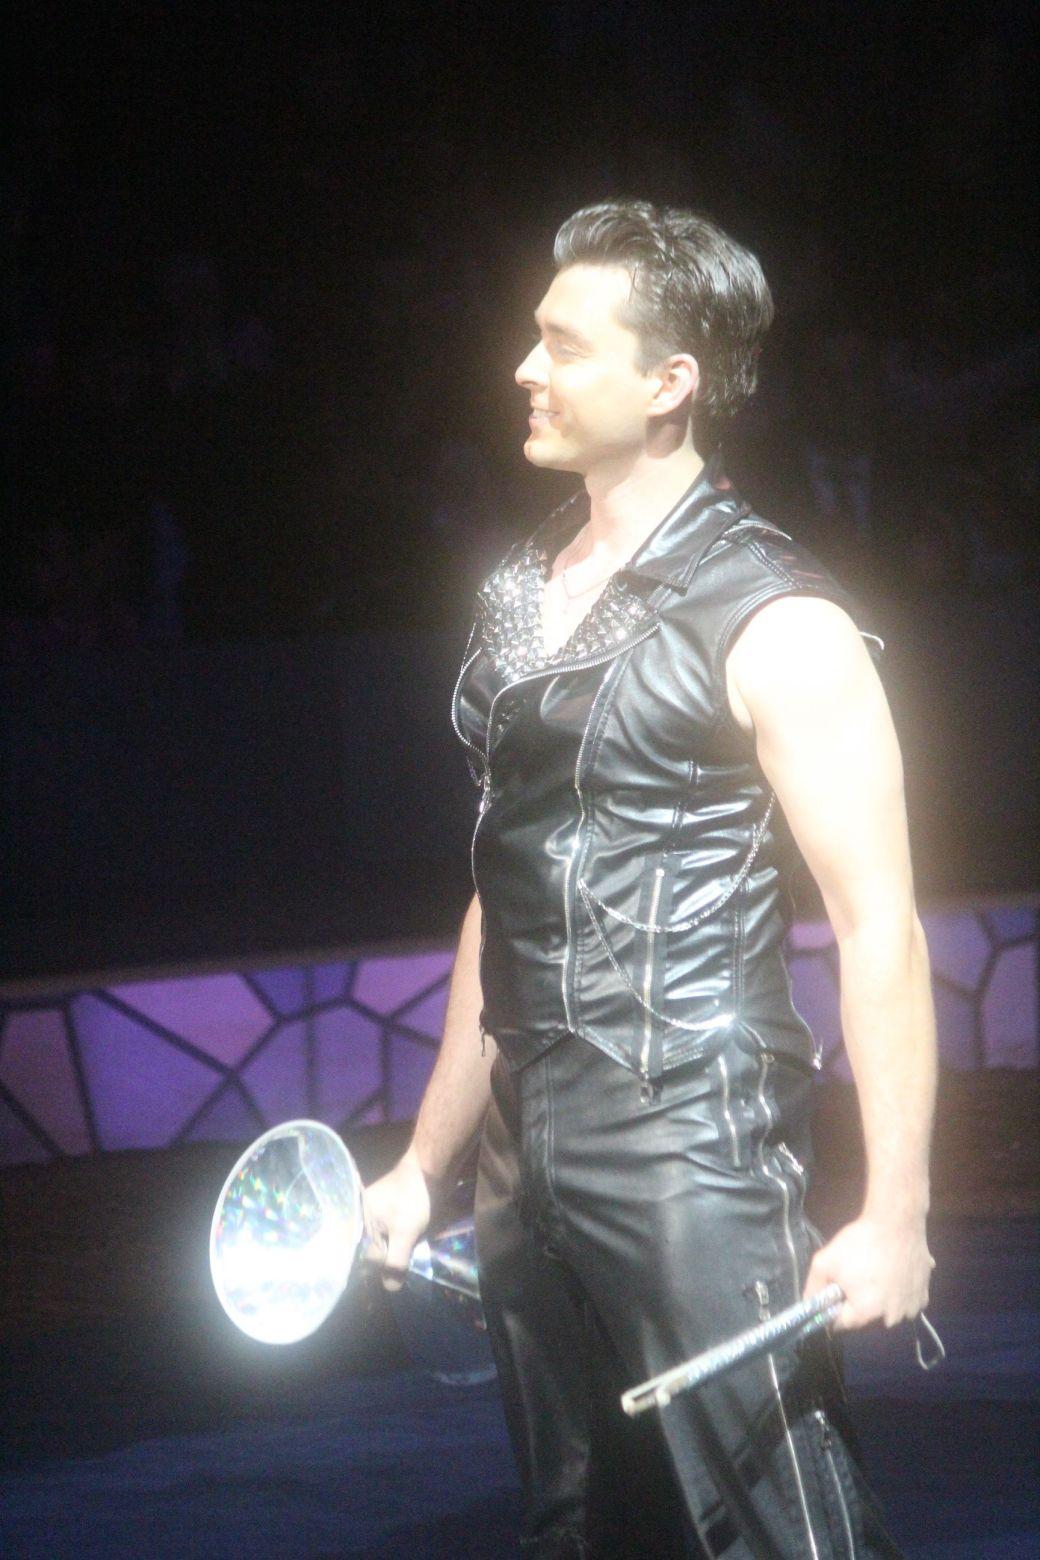 boston big apple circus performance april 29 2015 circus performer 3